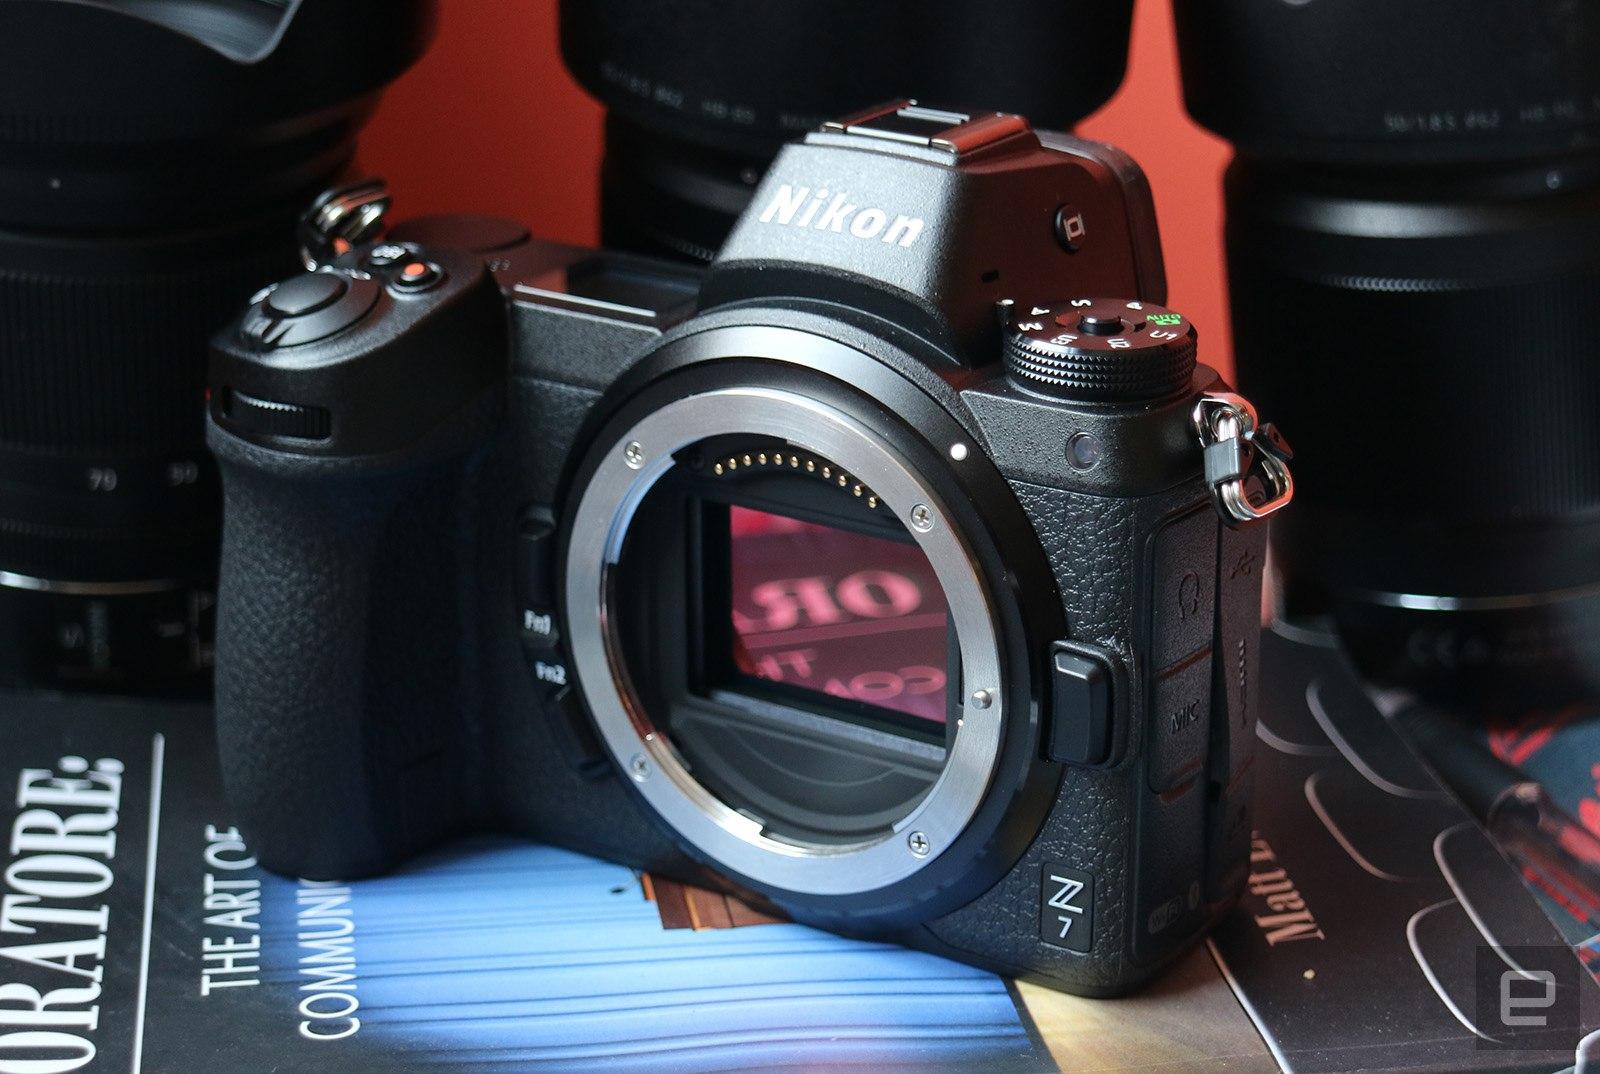 Nikon\'s Z7 mirrorless camera is a full-frame 45.7-megapixel beast